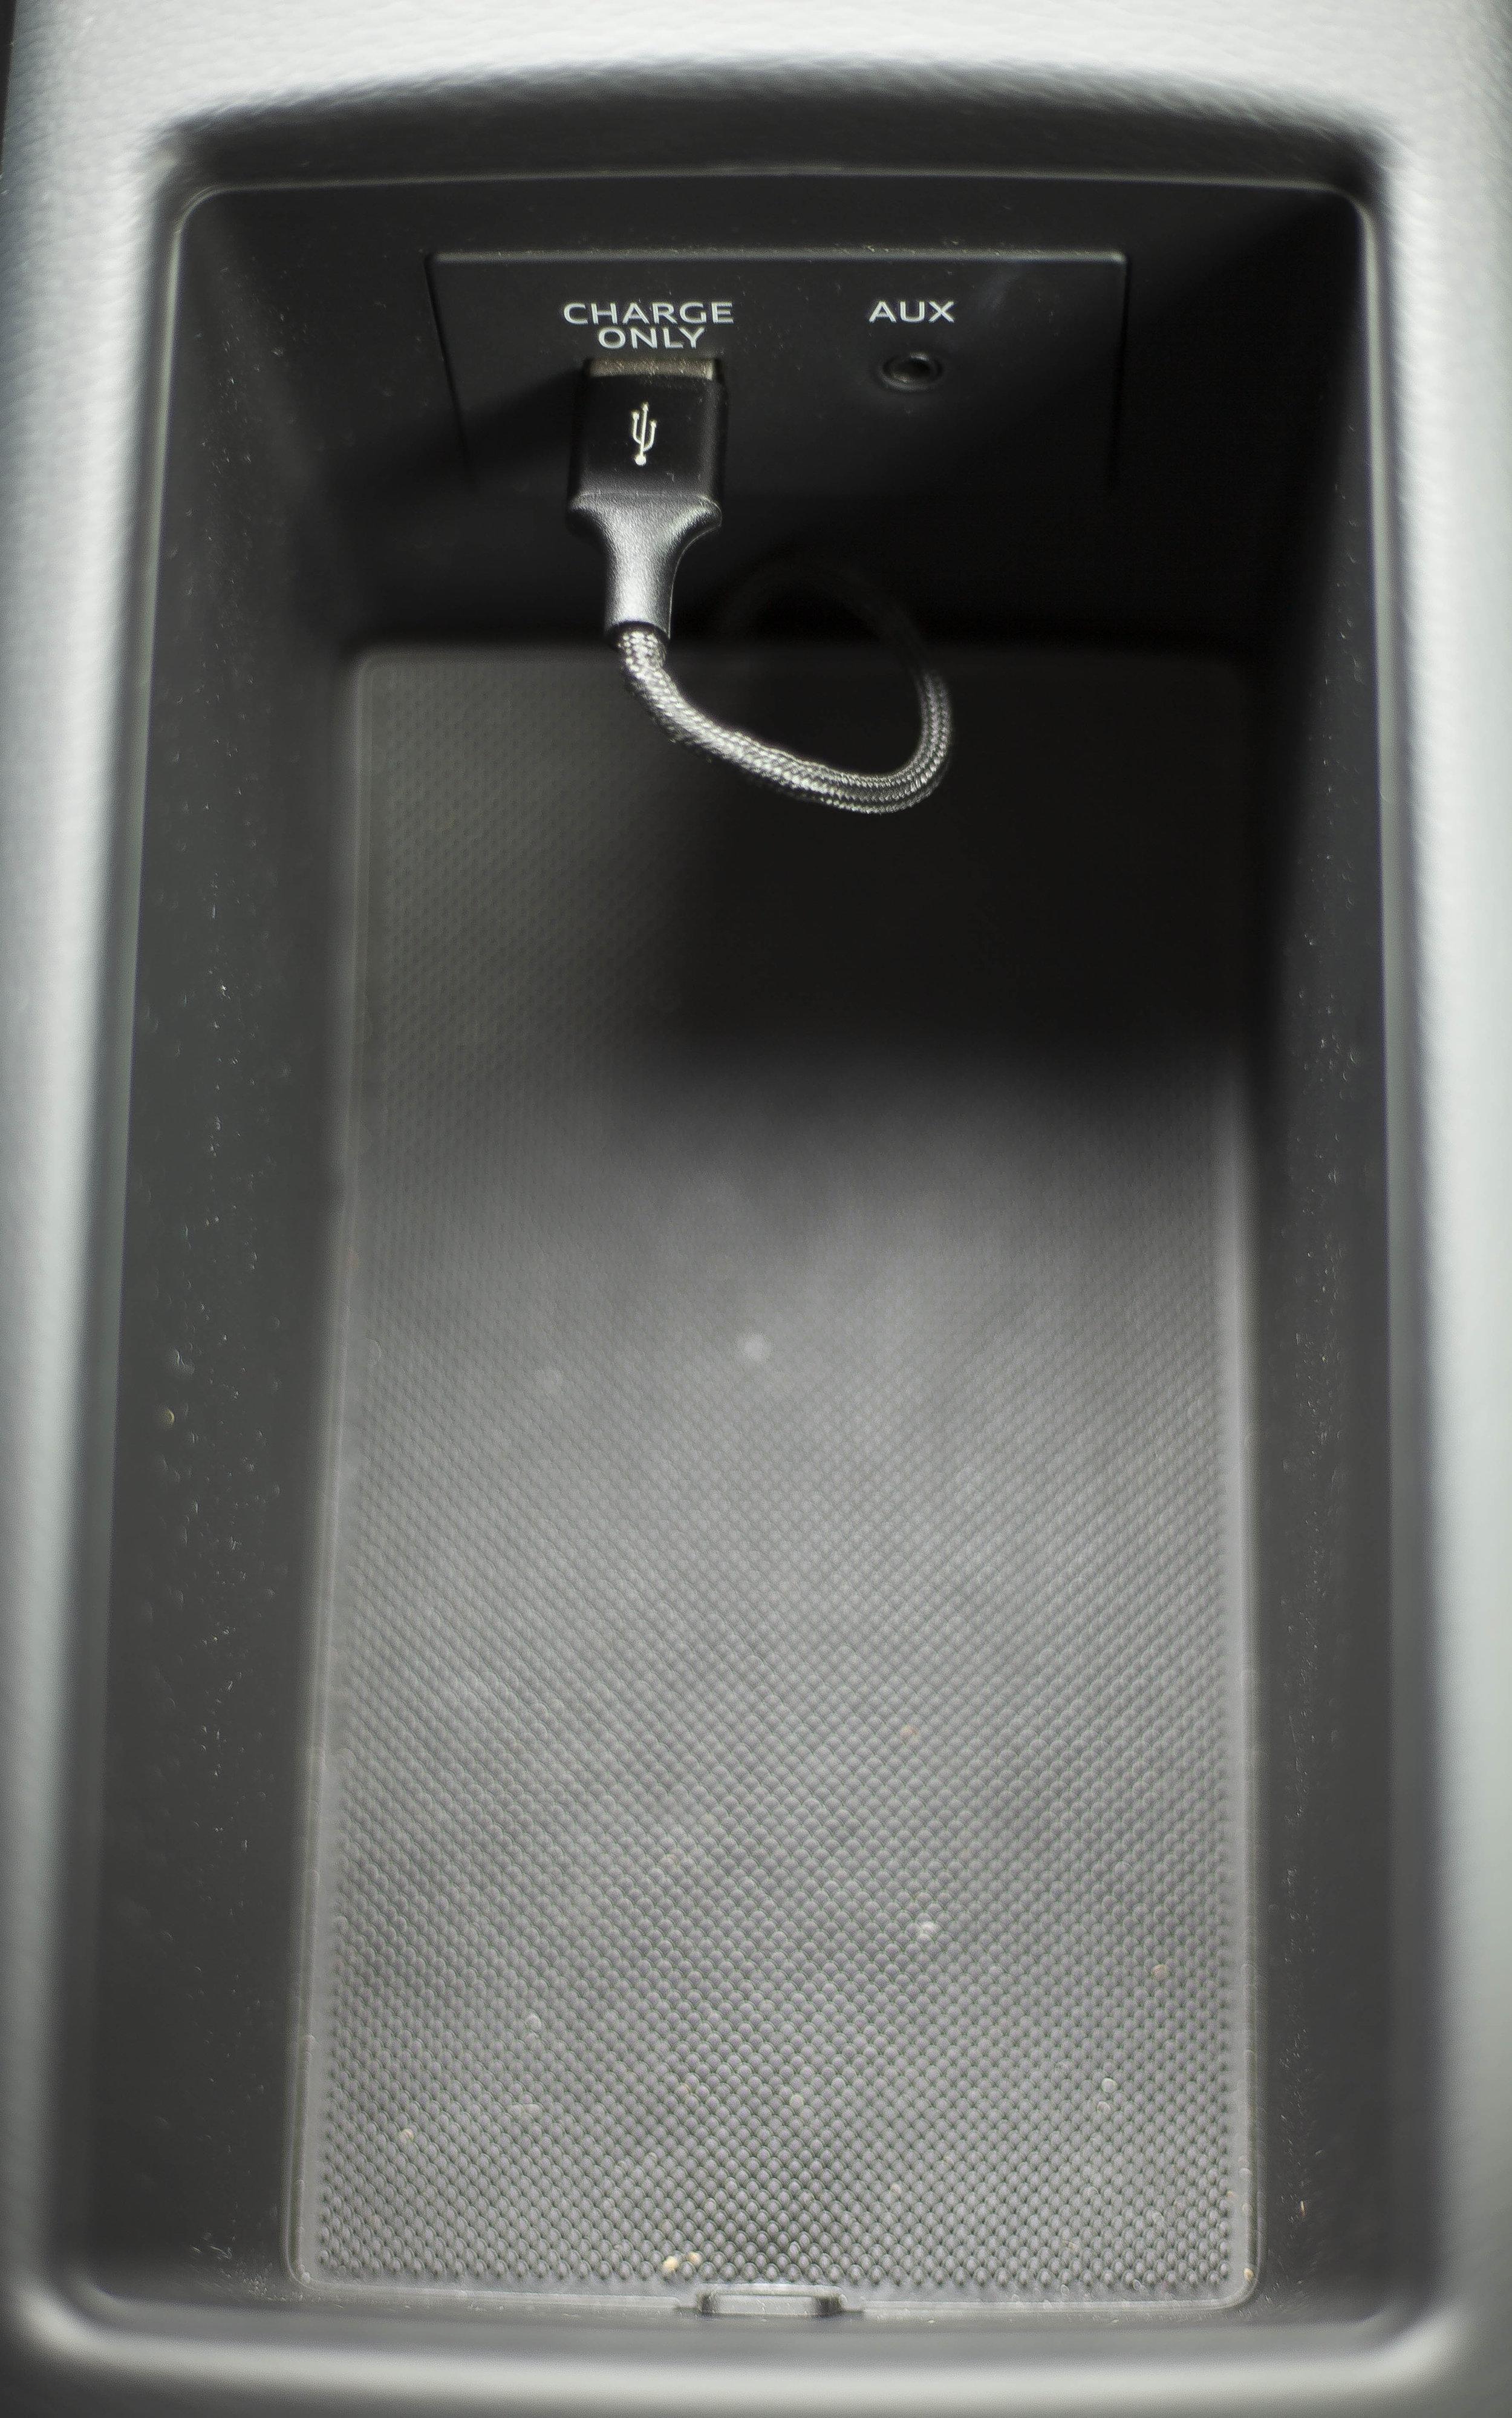 Audi middensteun.jpg